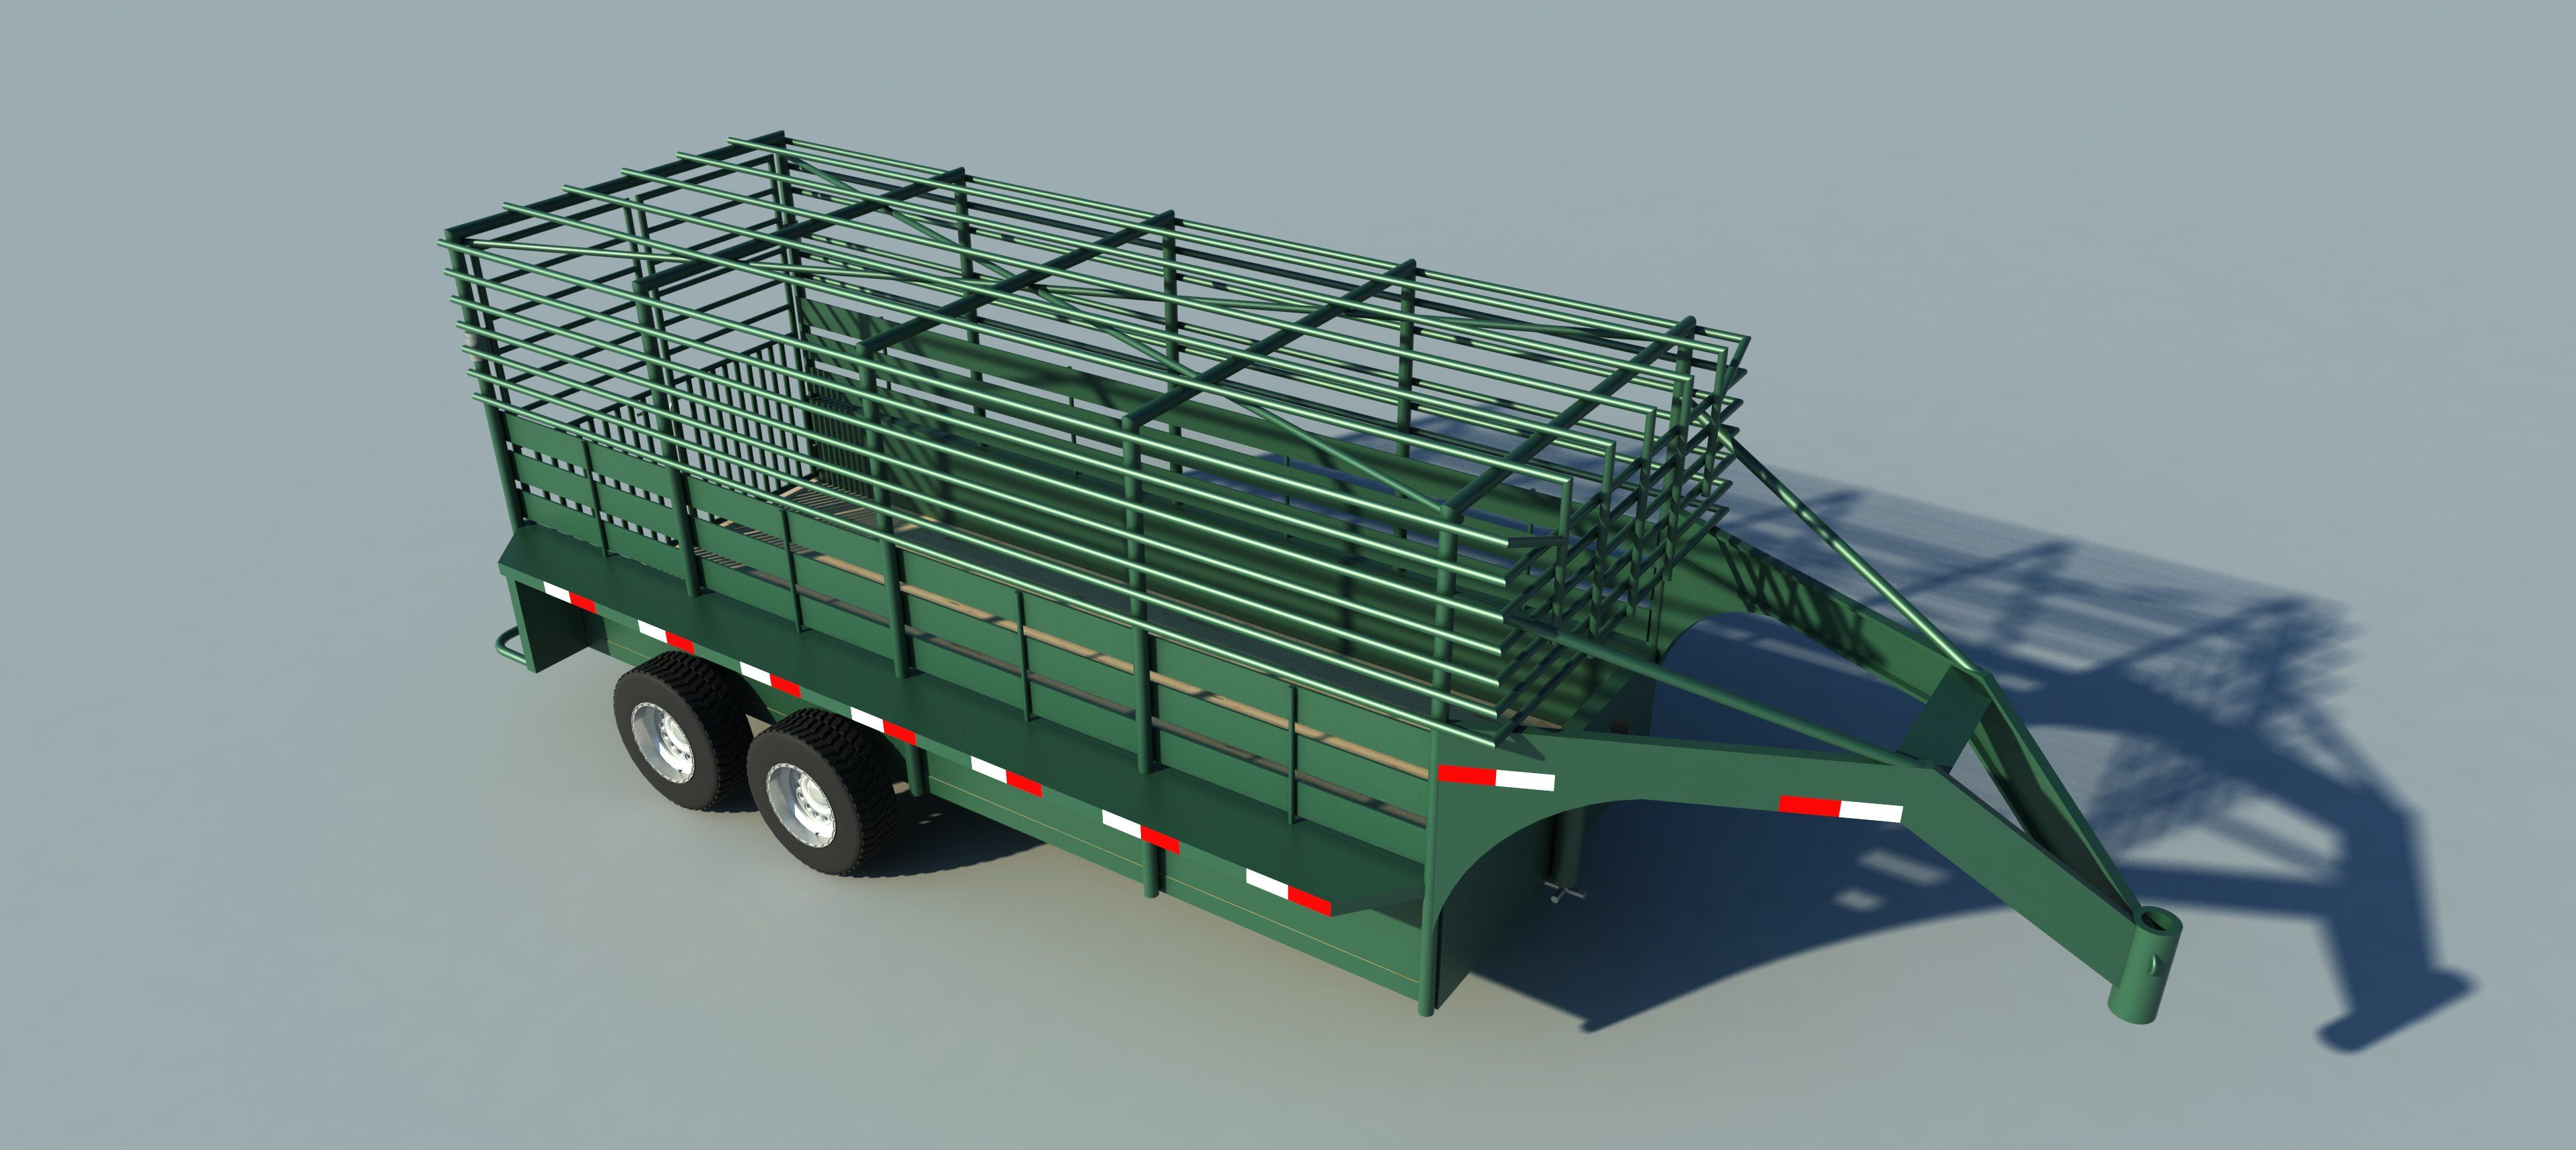 Build your own 16' Gooseneck Trailer (DIY Plans) Fun to build! Save money!